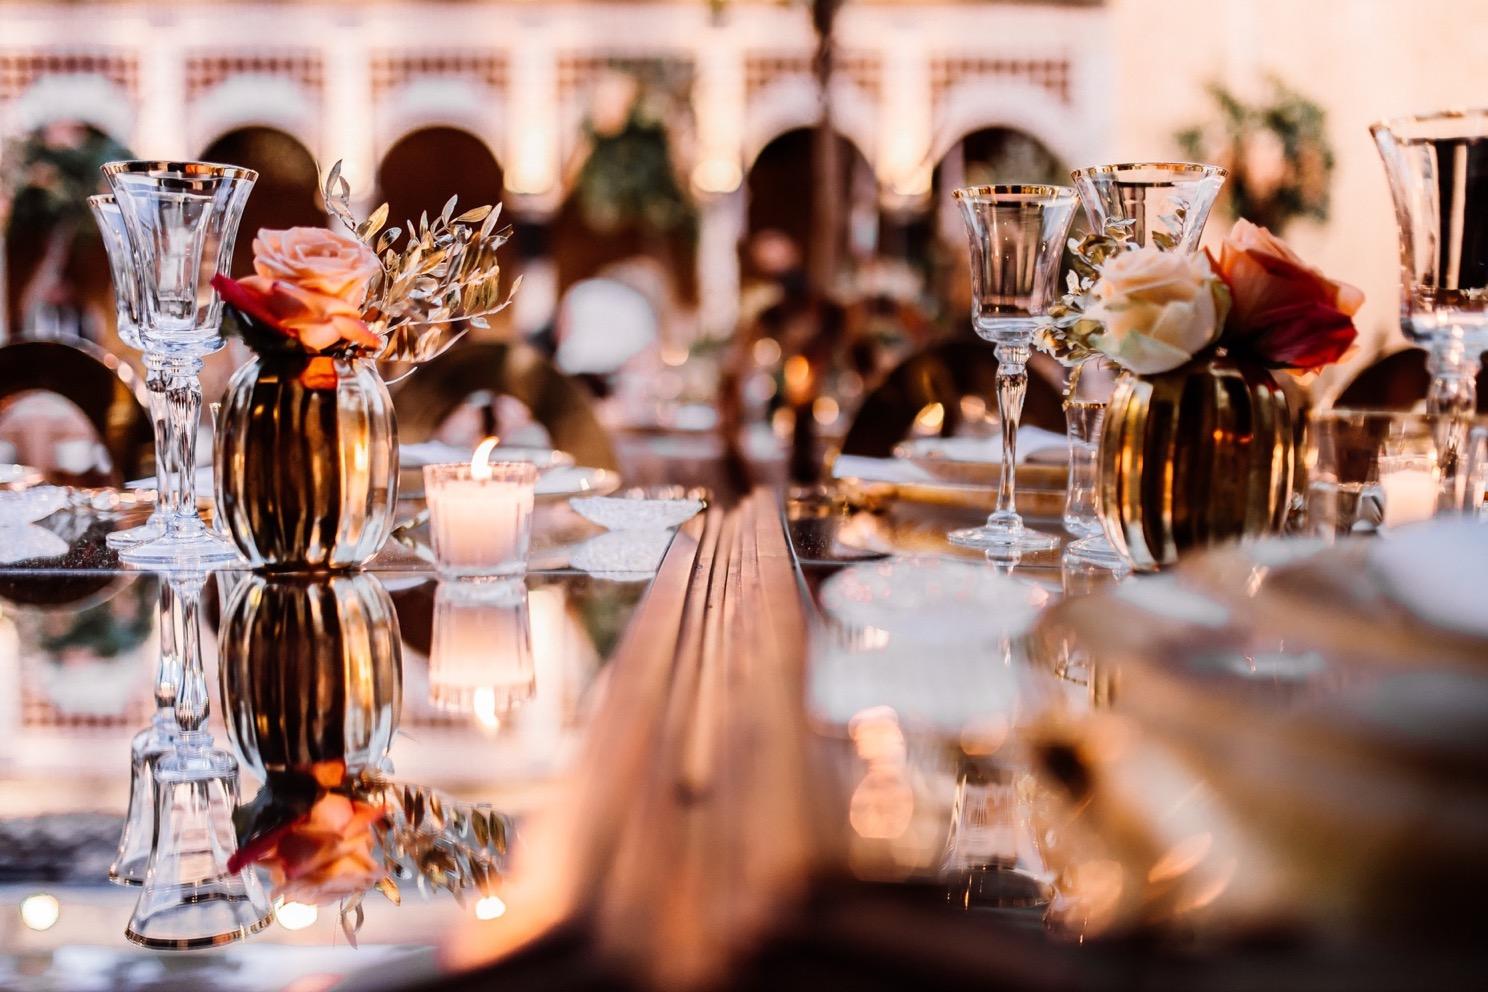 Si-Quiero-Wedding-Planner-By-Sira-Antequera-Bodas-Málaga-Marbella-Miami- L-A-10